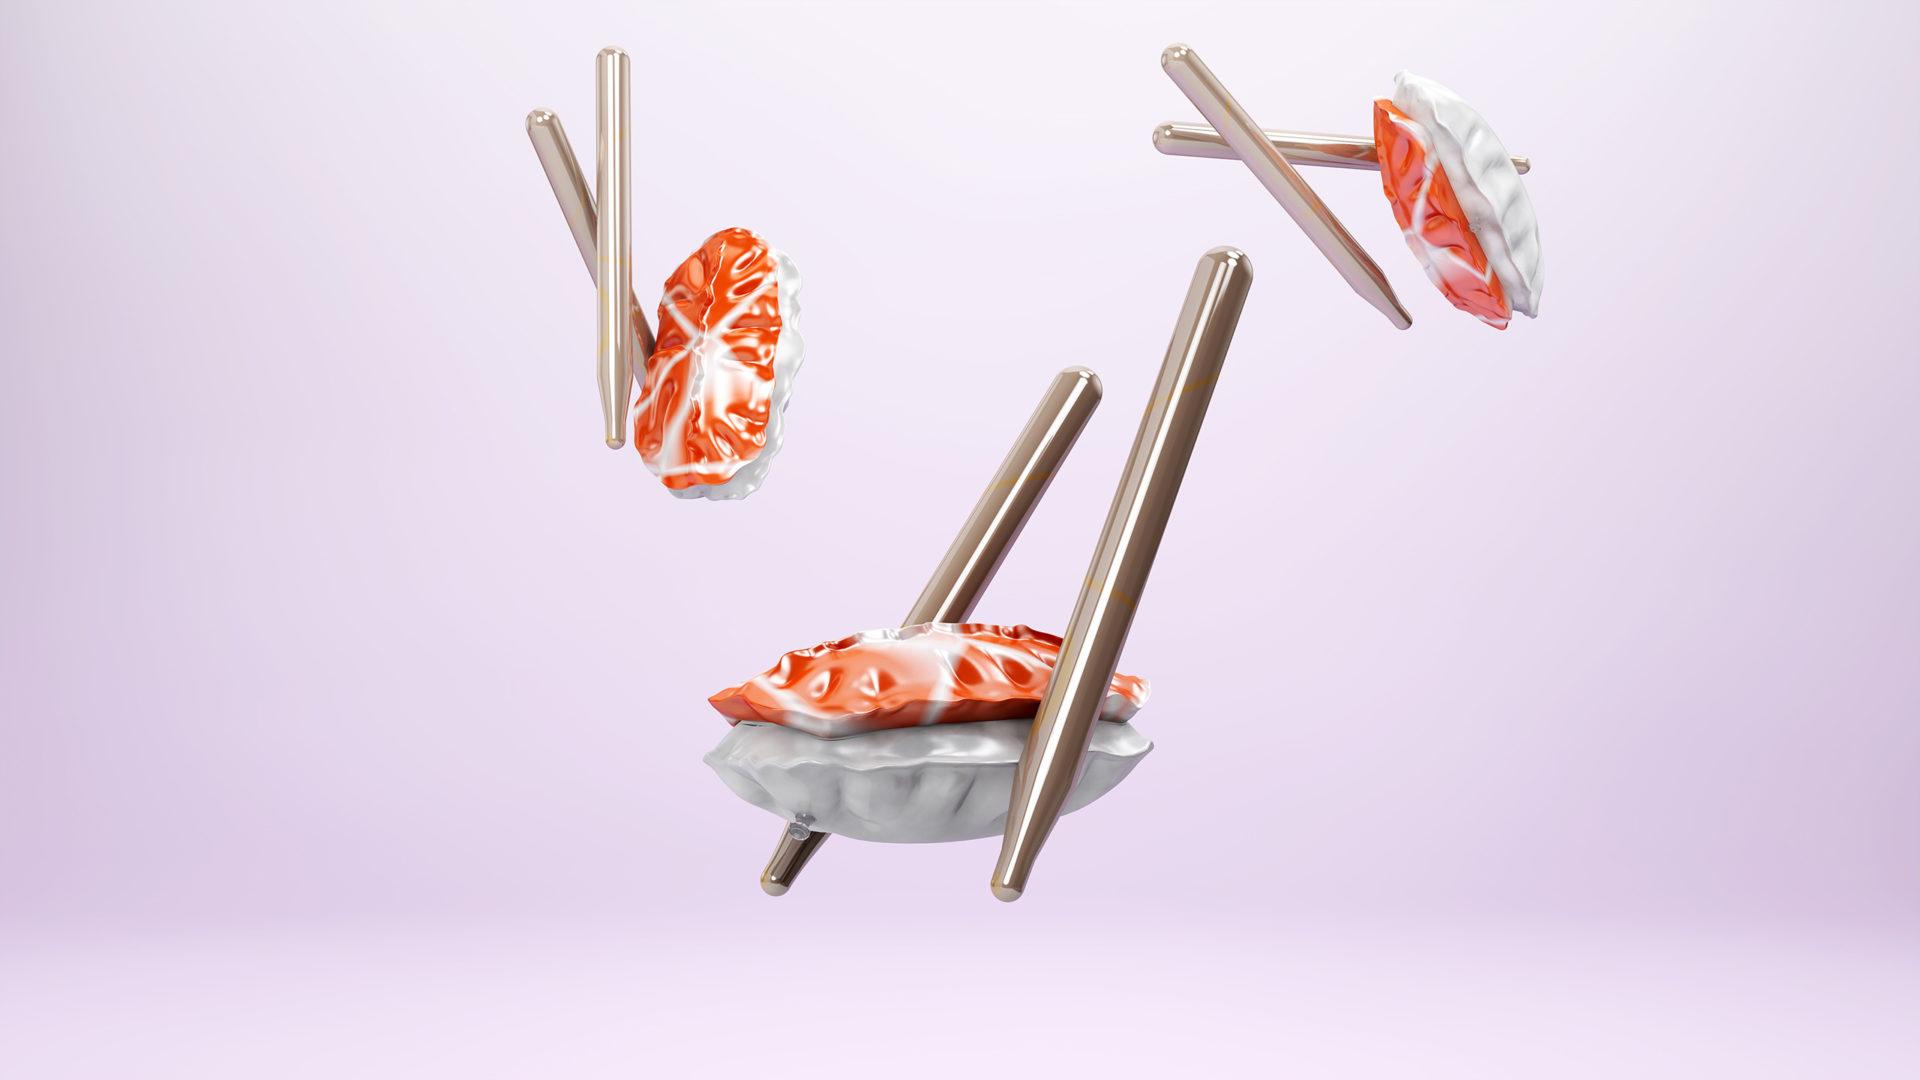 Plastik Lebensmittel. Sushi aus Plastik.